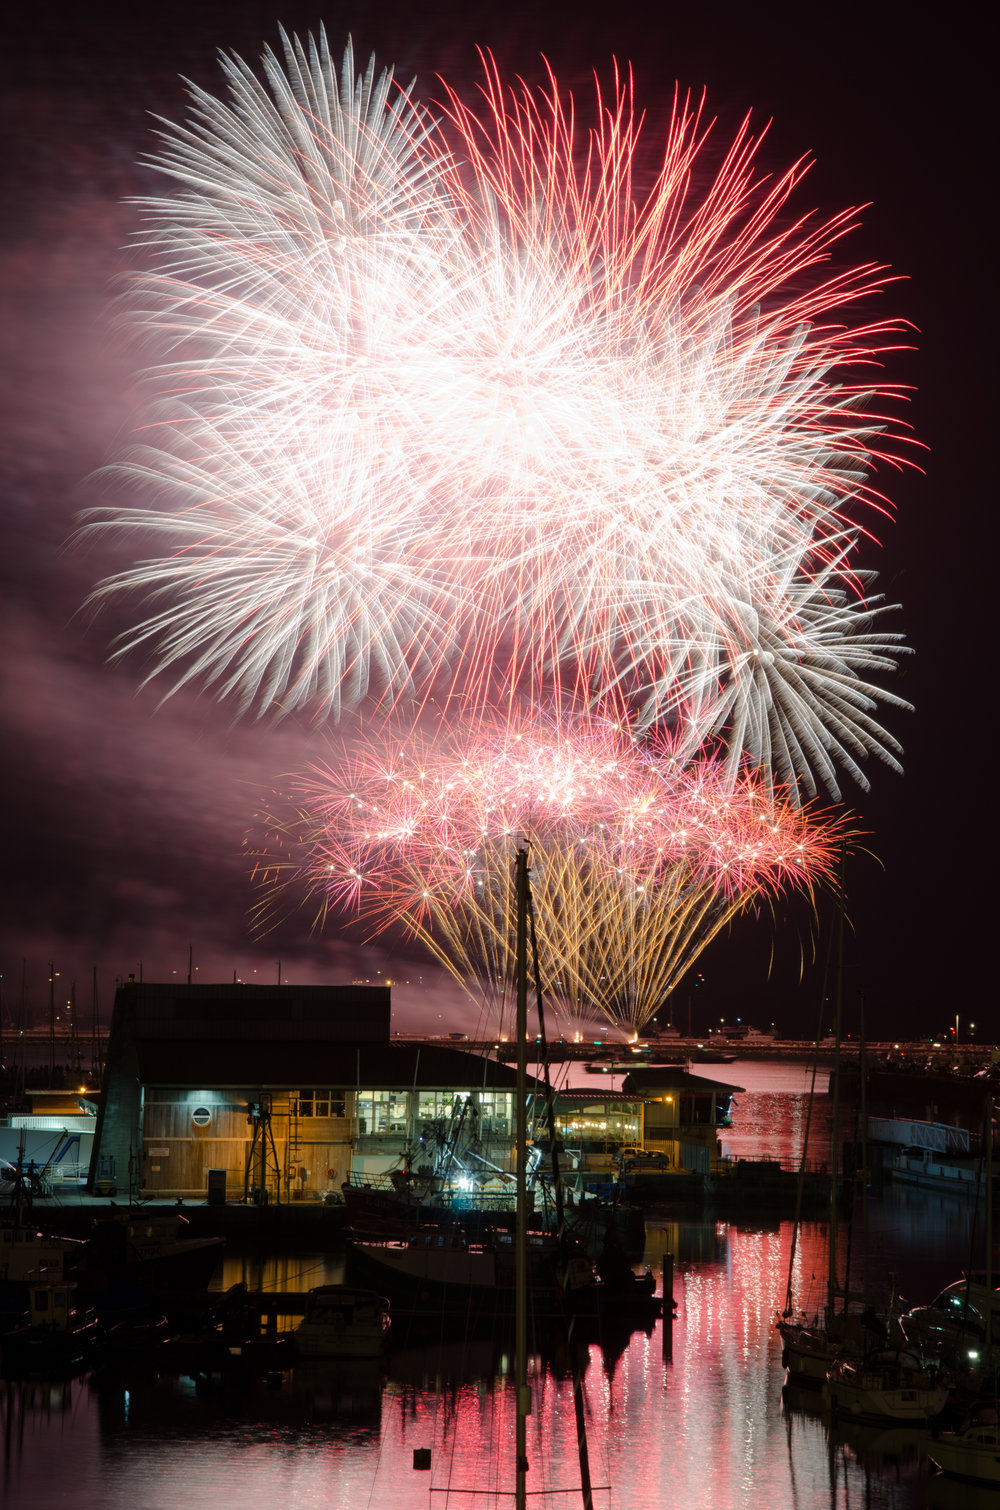 Star Fireworks Championship Winning Display